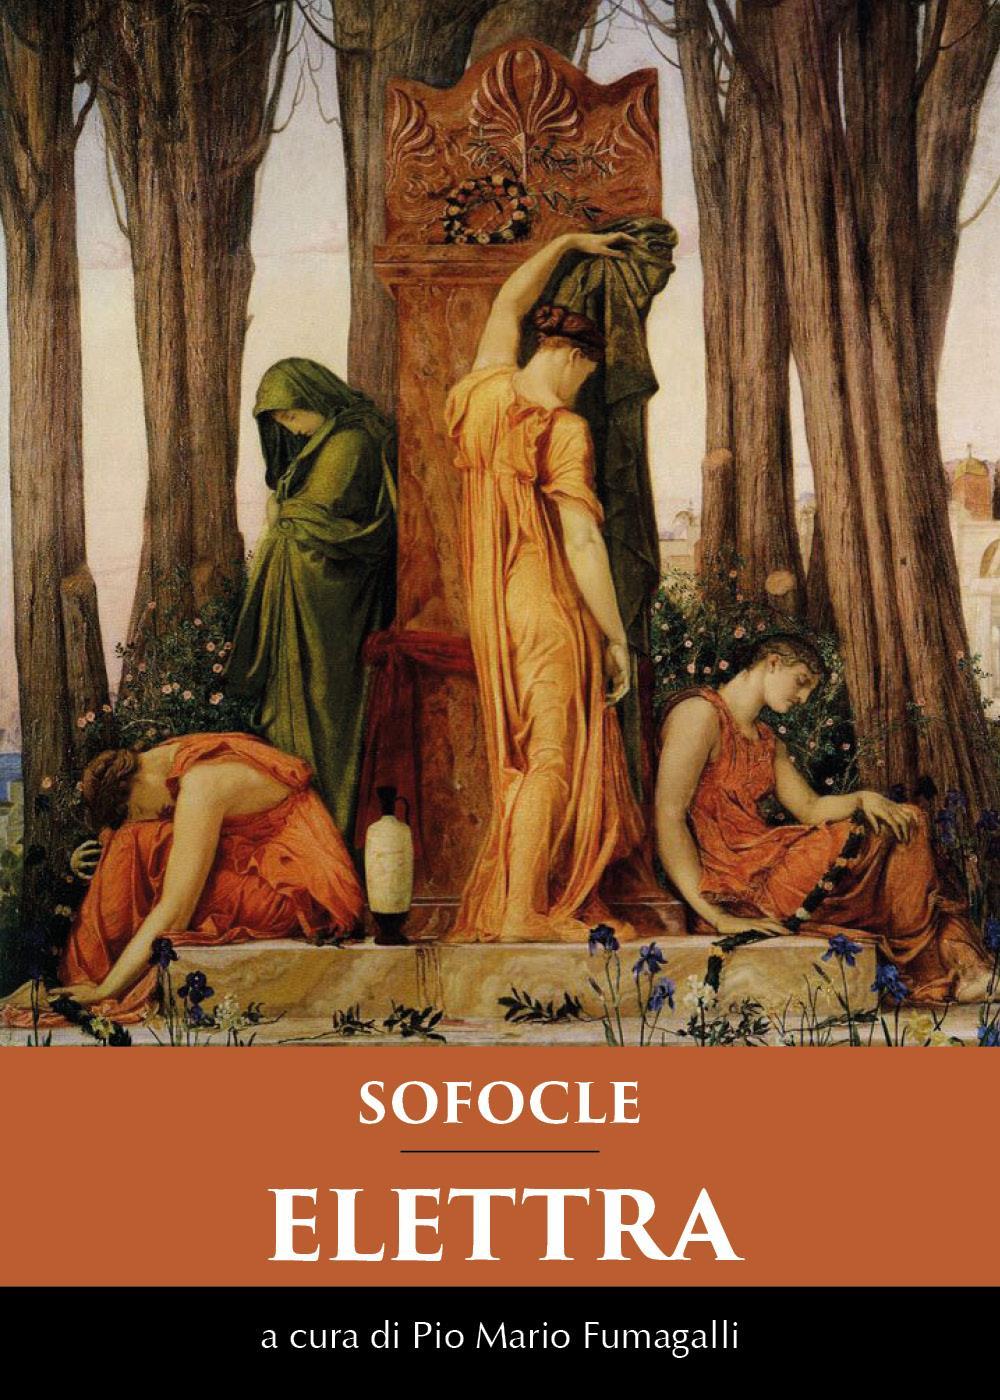 Sofocle - Elettra